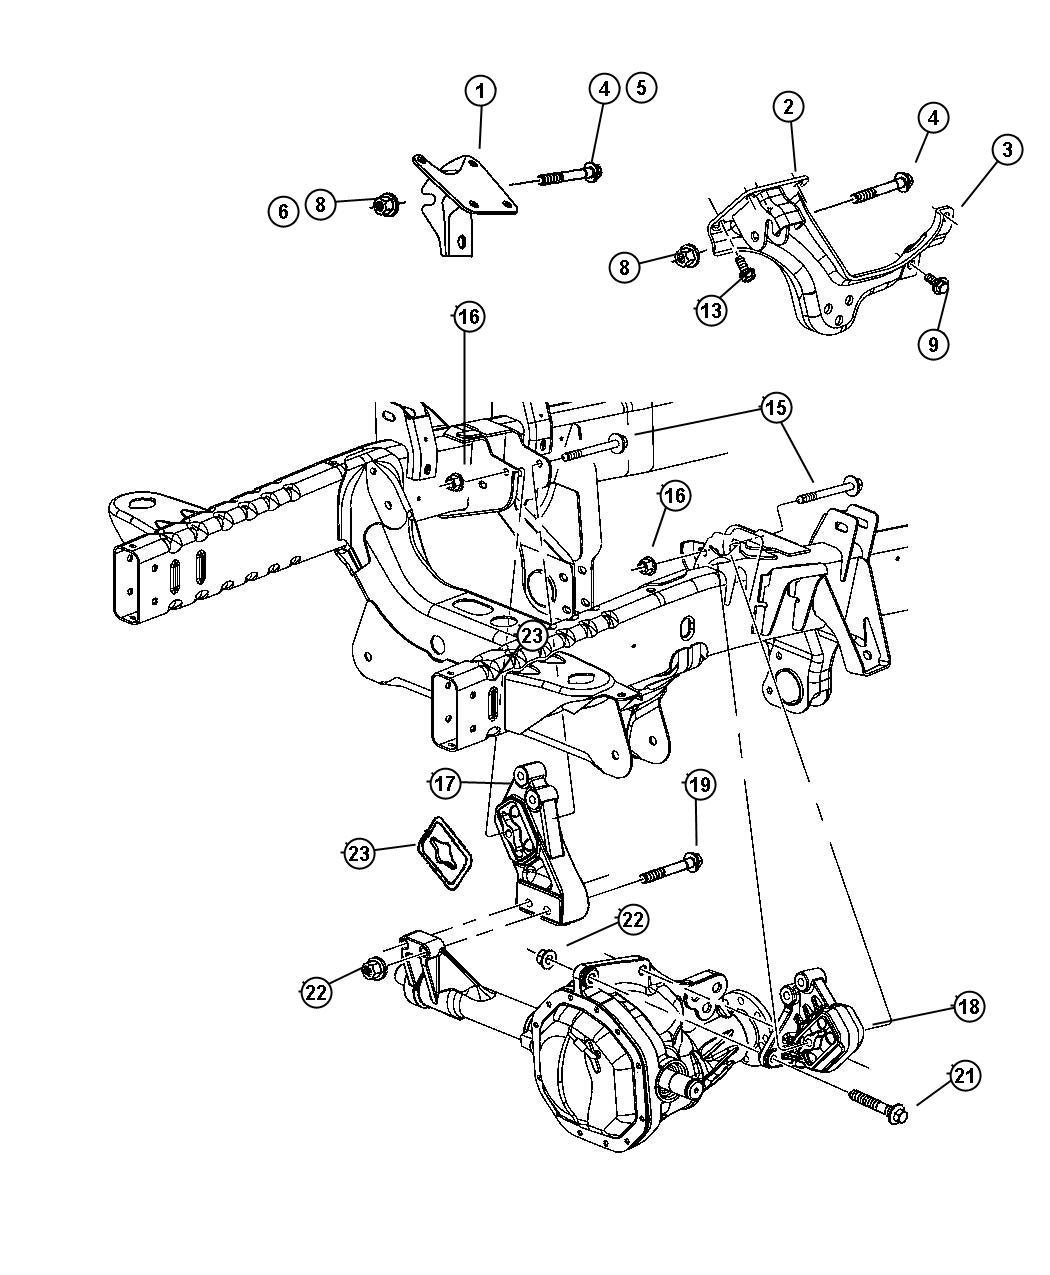 Dodge Ram Insulator Engine Mount For Ez0 Front